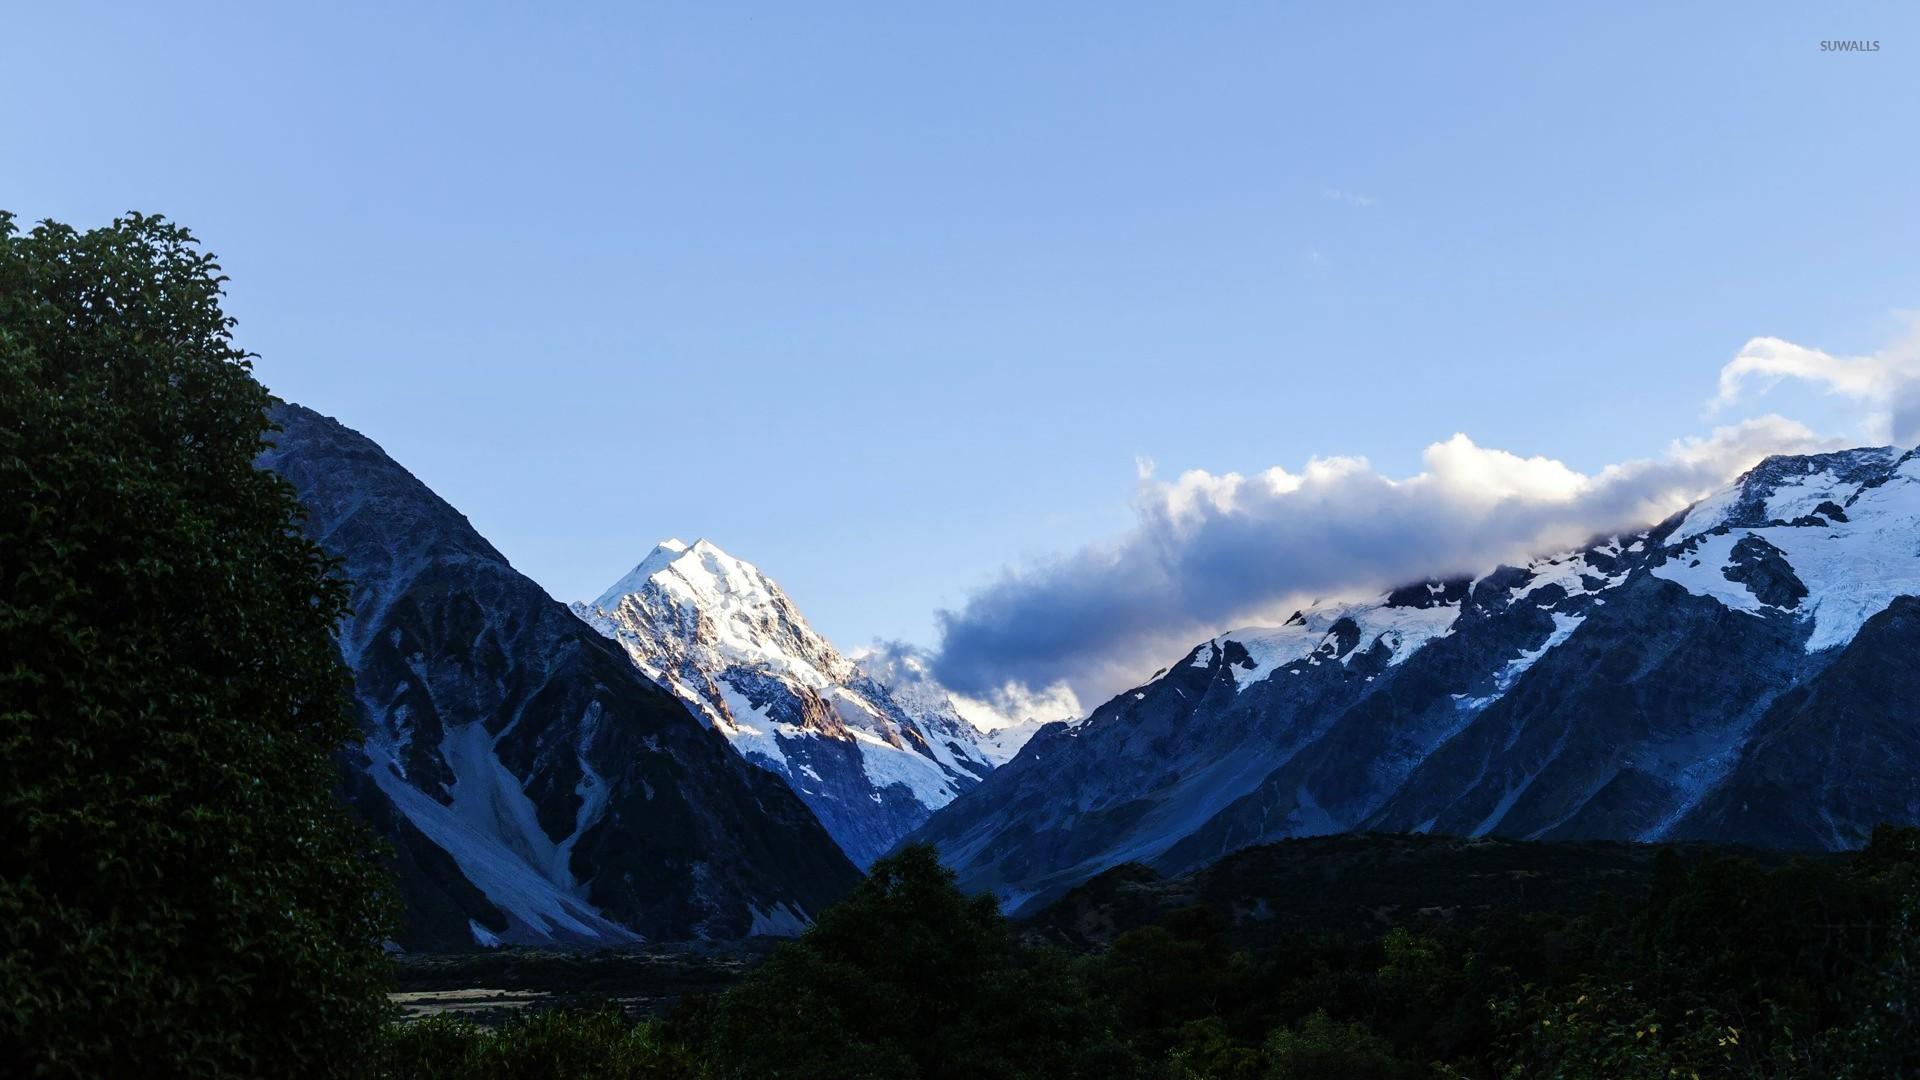 Lake Hawea New Zealand Wallpaper